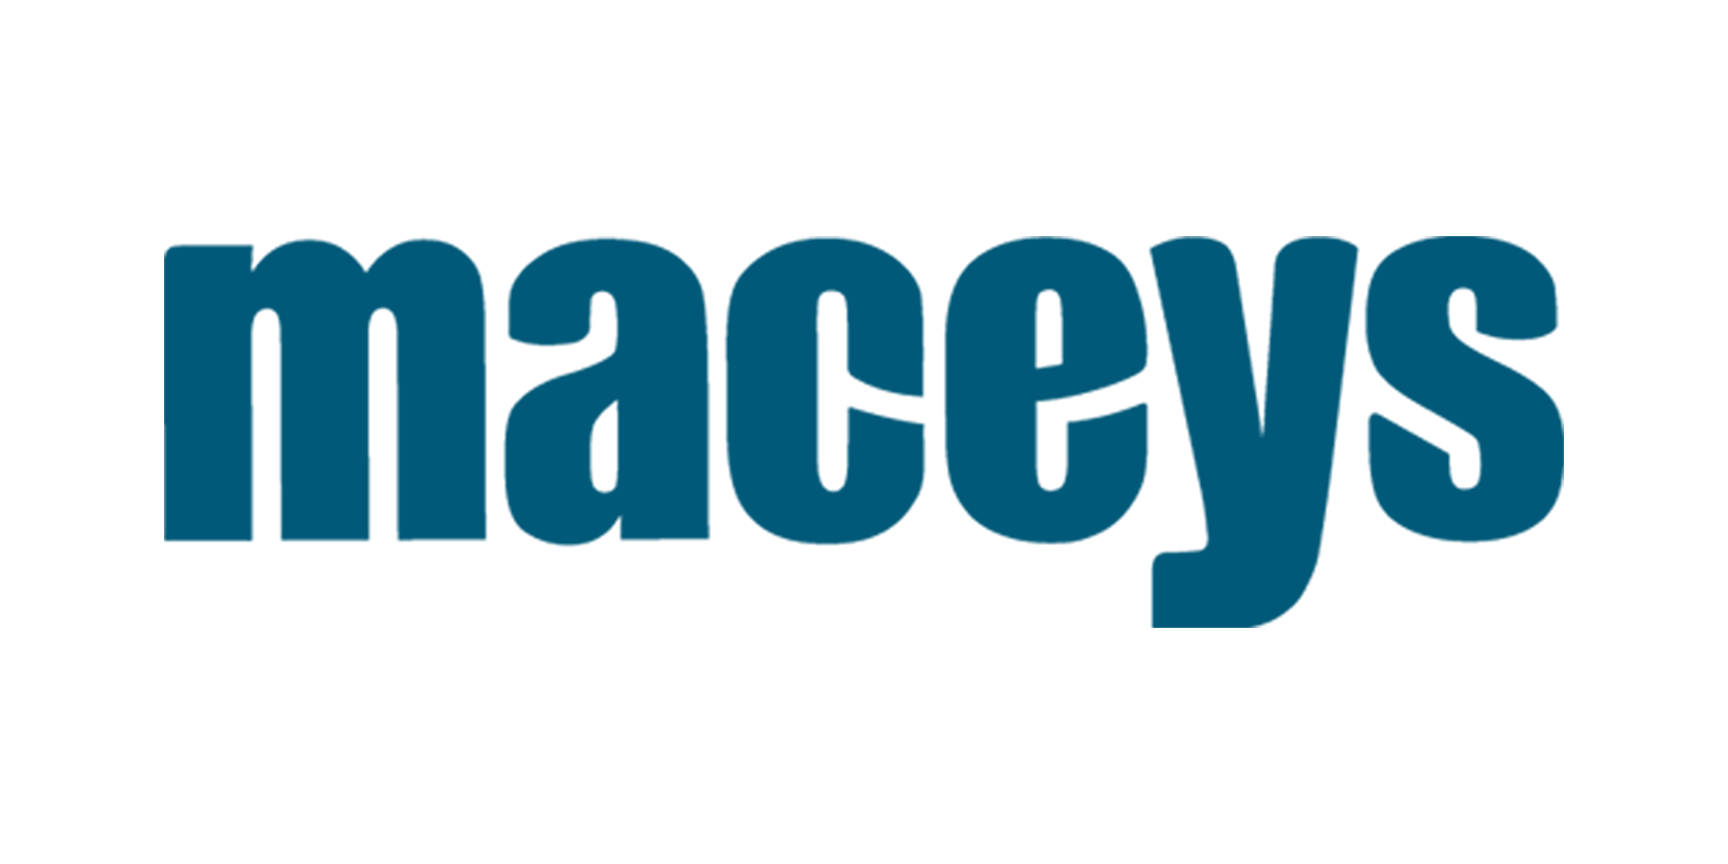 Macey2012.png